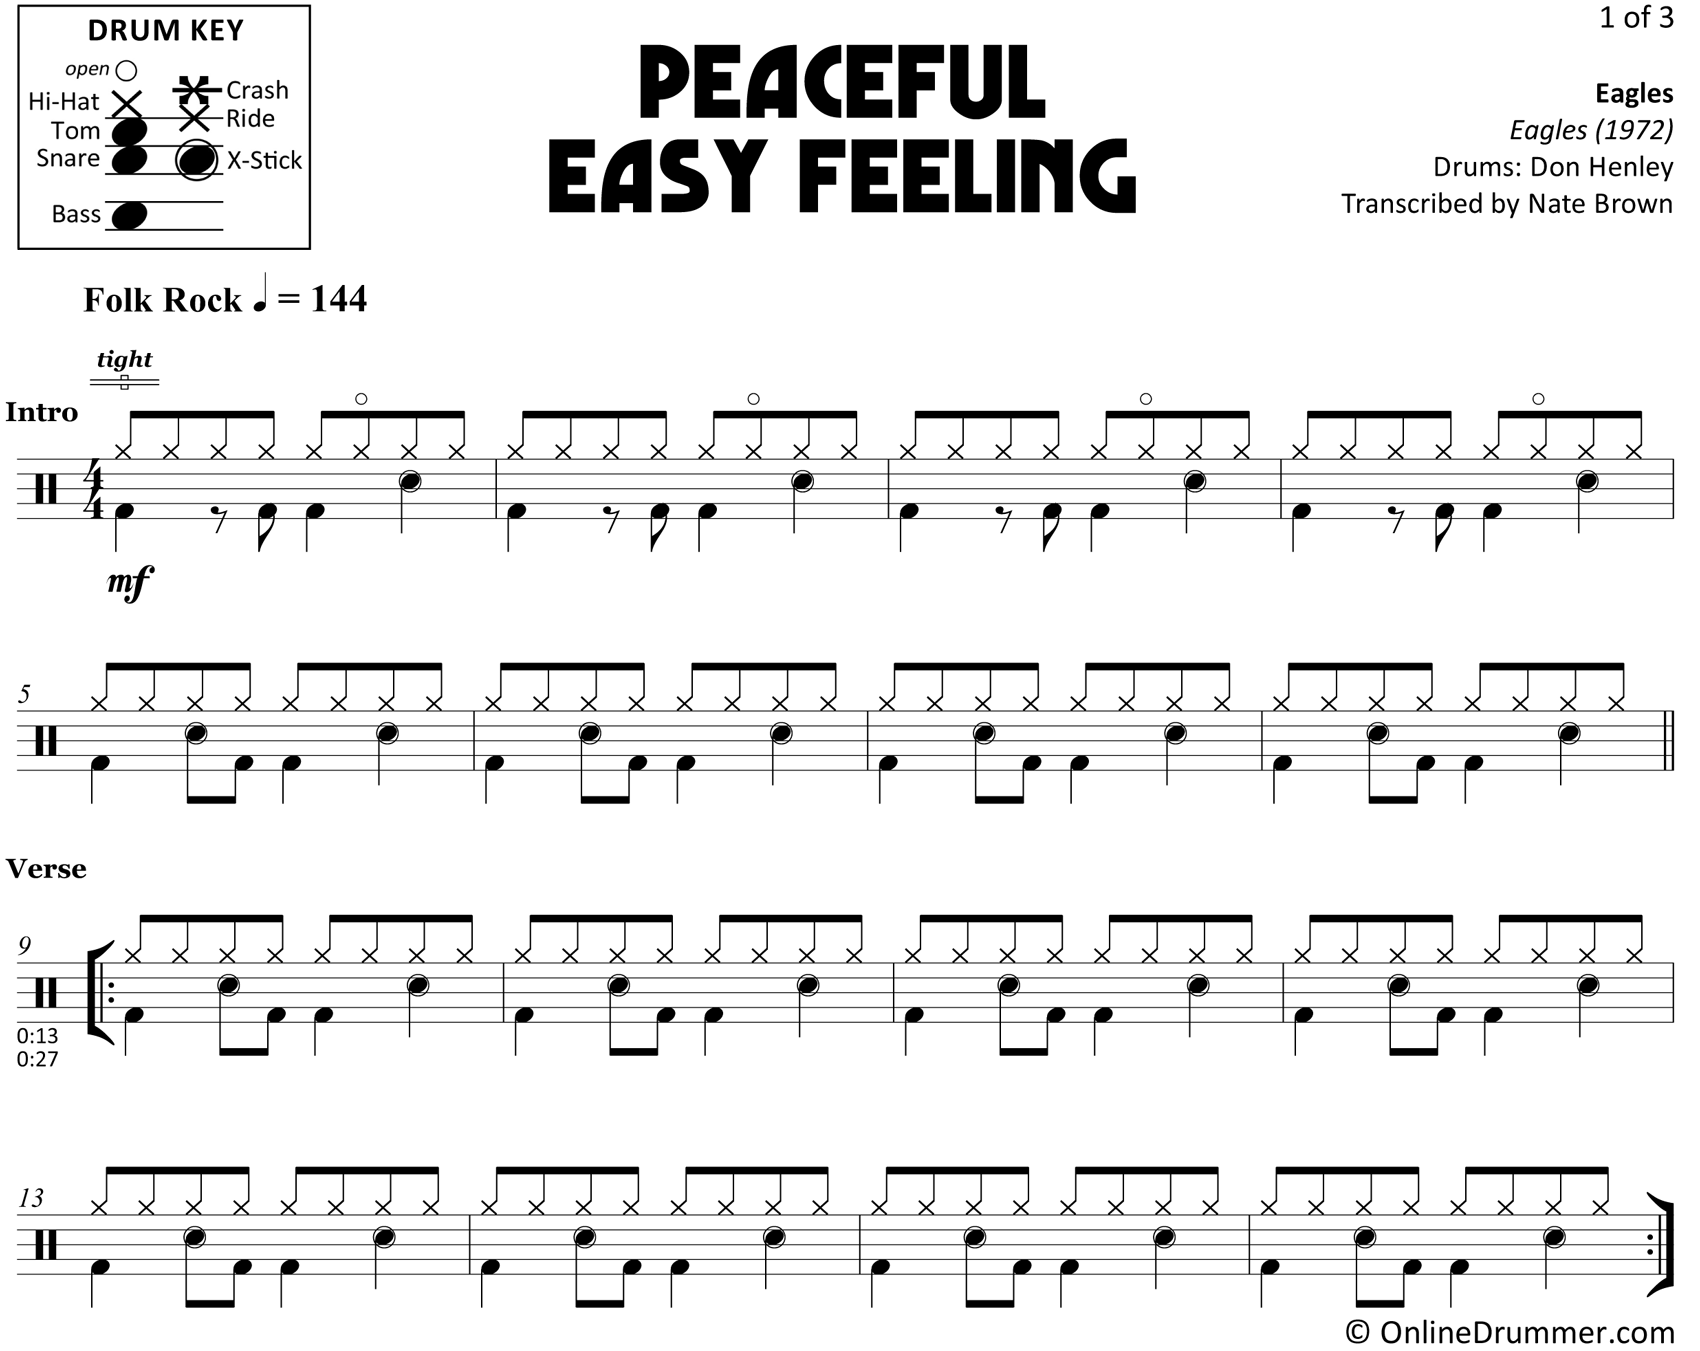 Peaceful Easy Feeling - Eagles - Drum Sheet Music